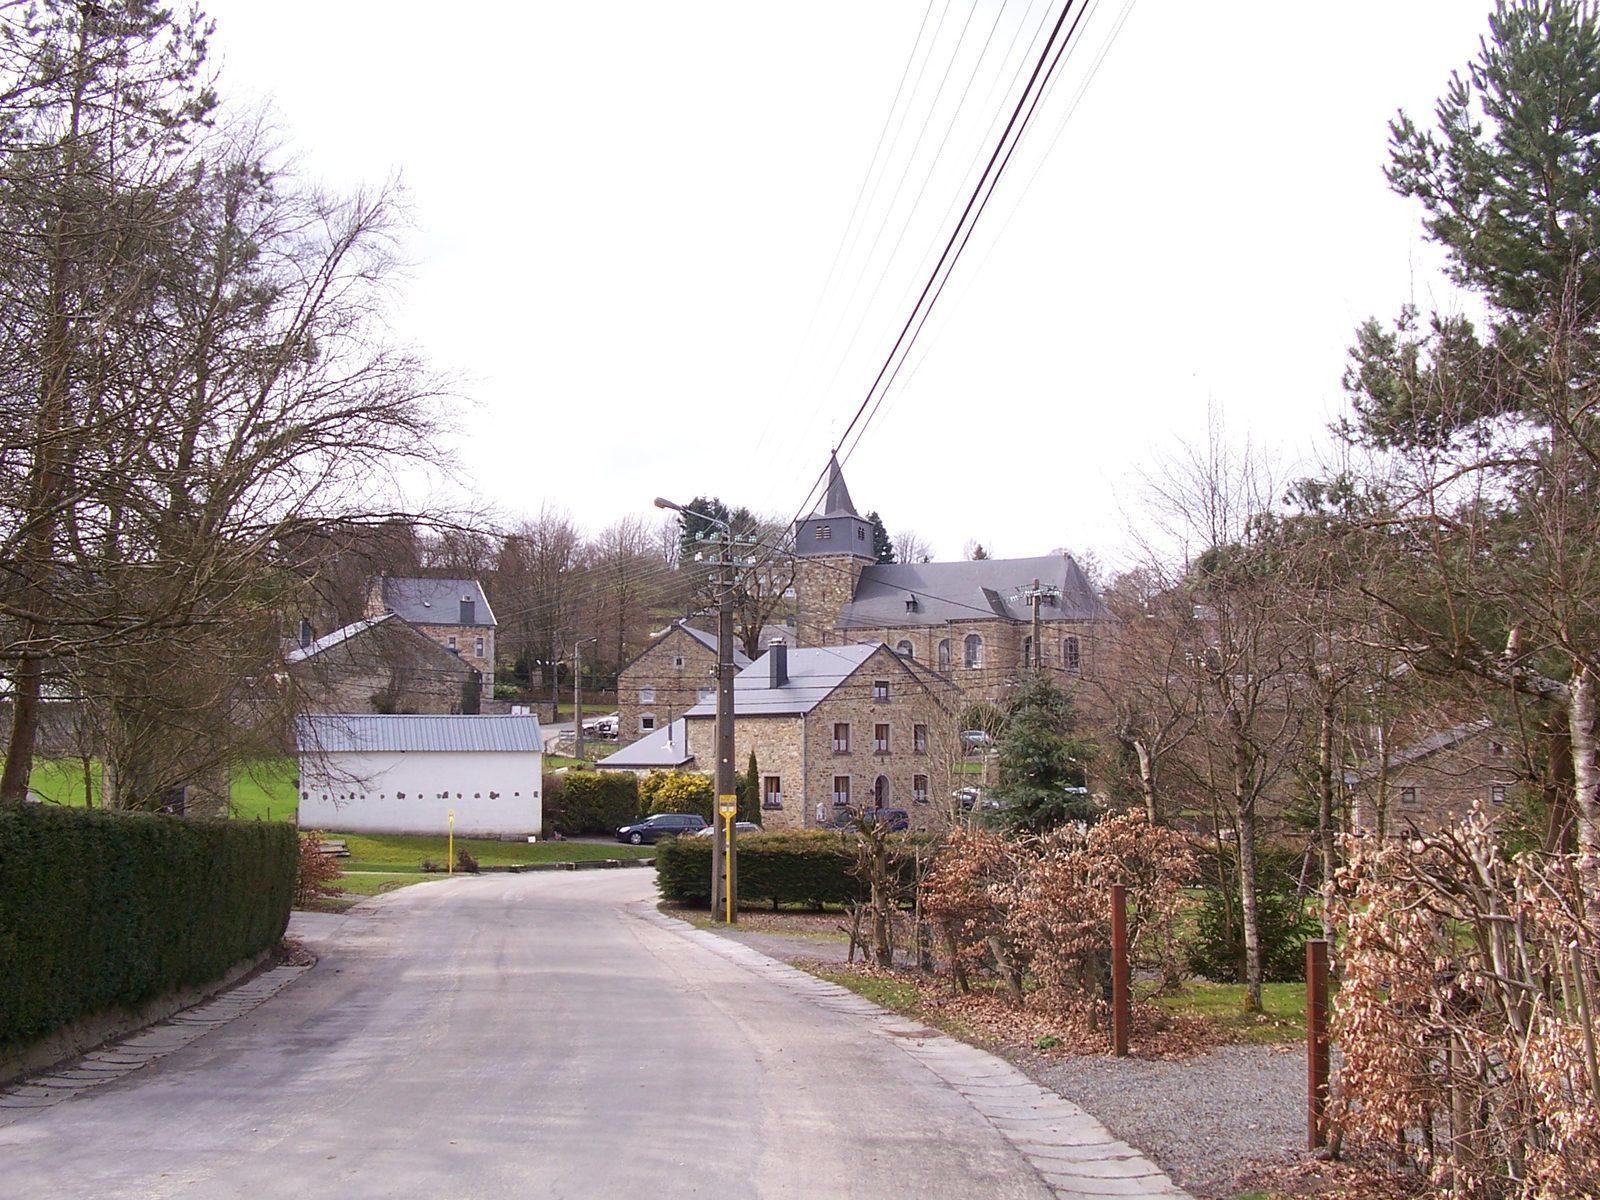 Dochamps in the Belgian Ardennes